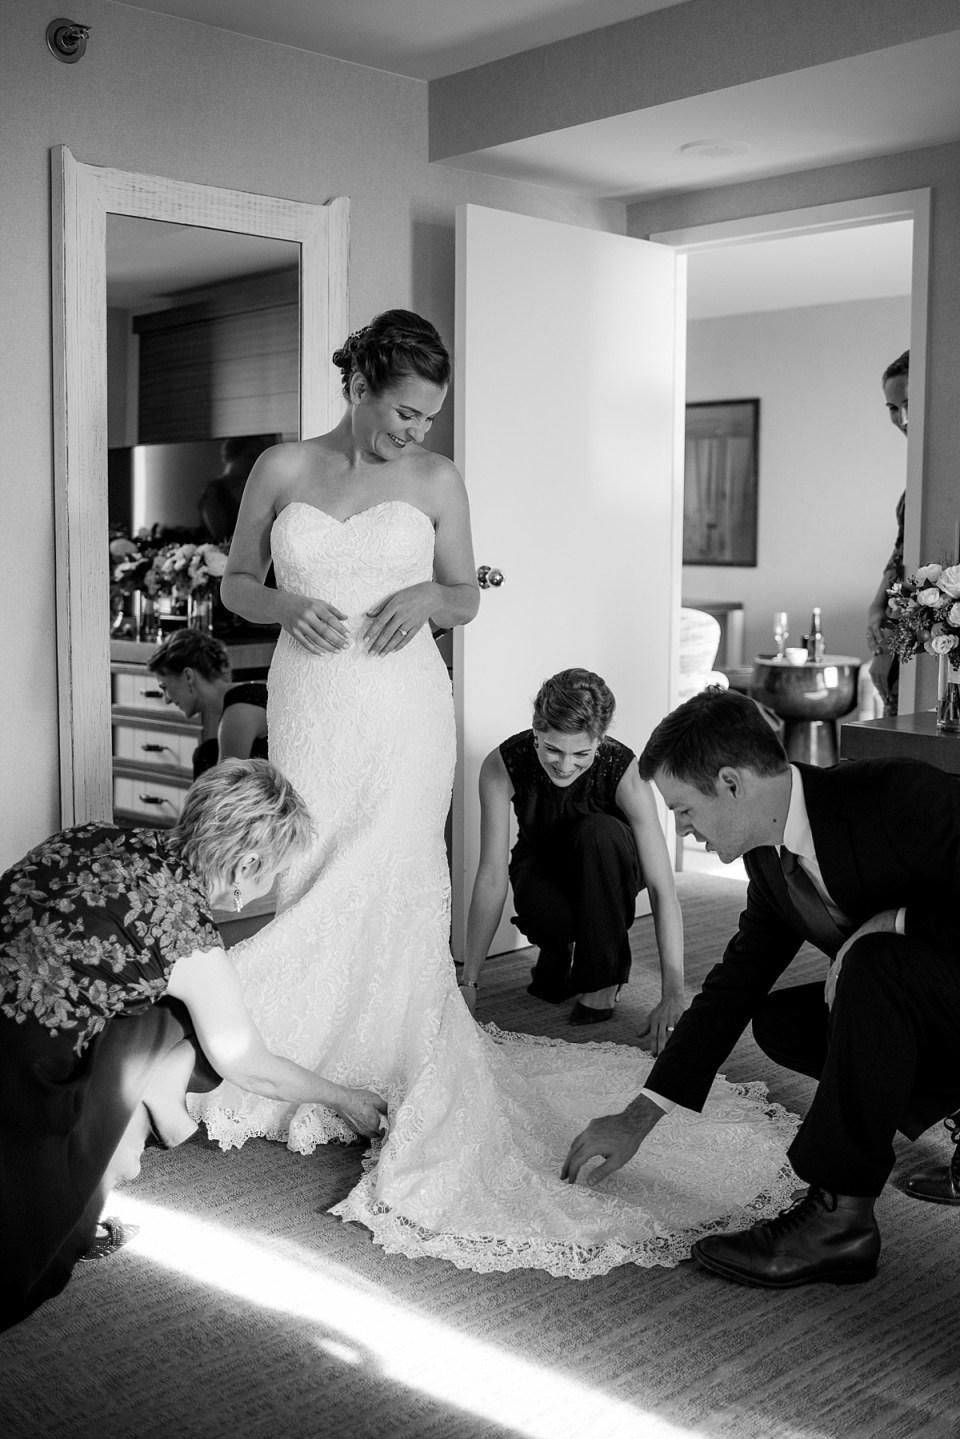 Winter Wedding at 48 Fields in Leesburg, VA